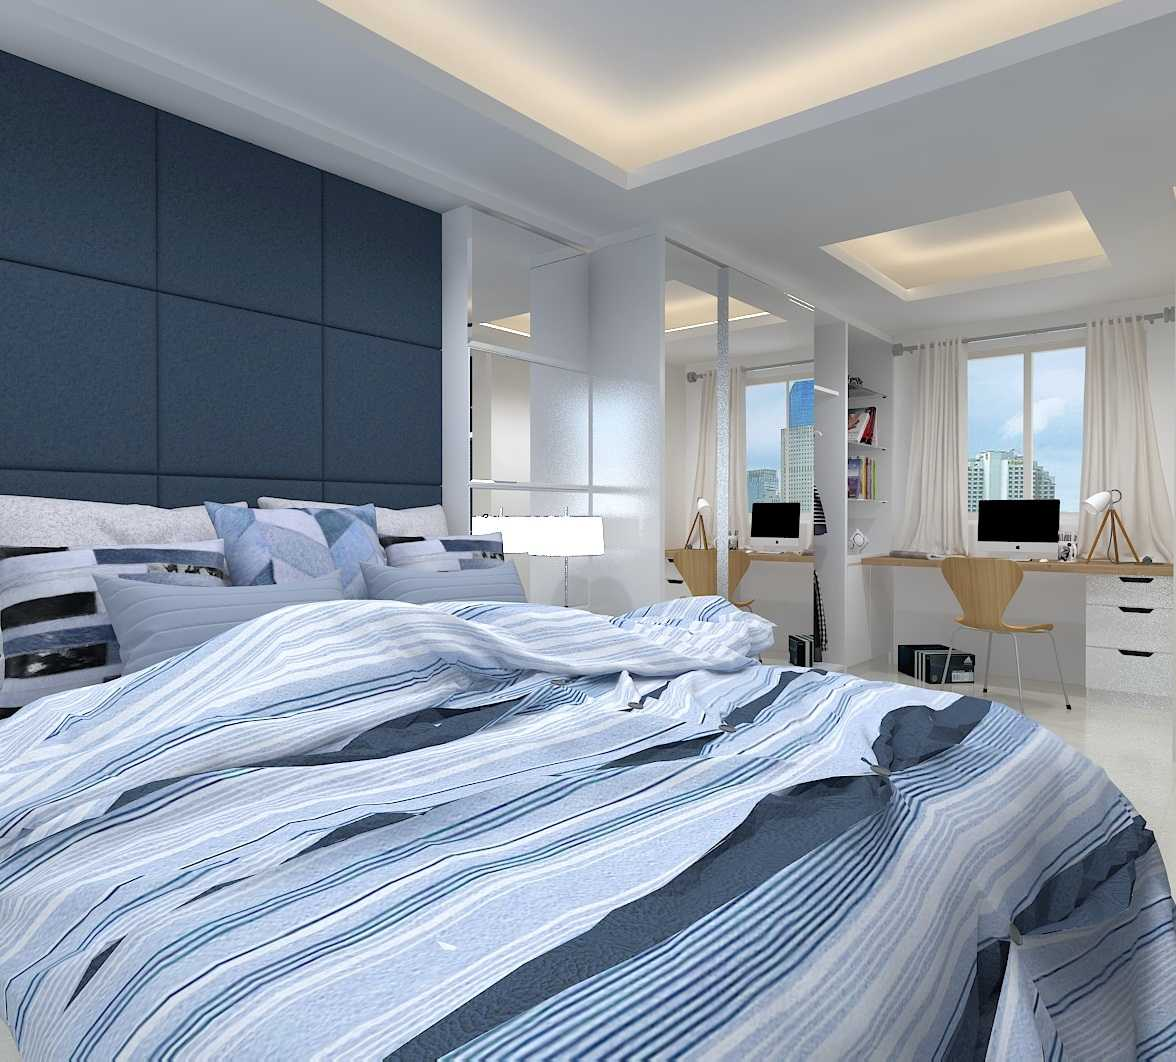 Desain interior kamar tidur Smart Living karya FIANO [Sumber: arsitag.com]